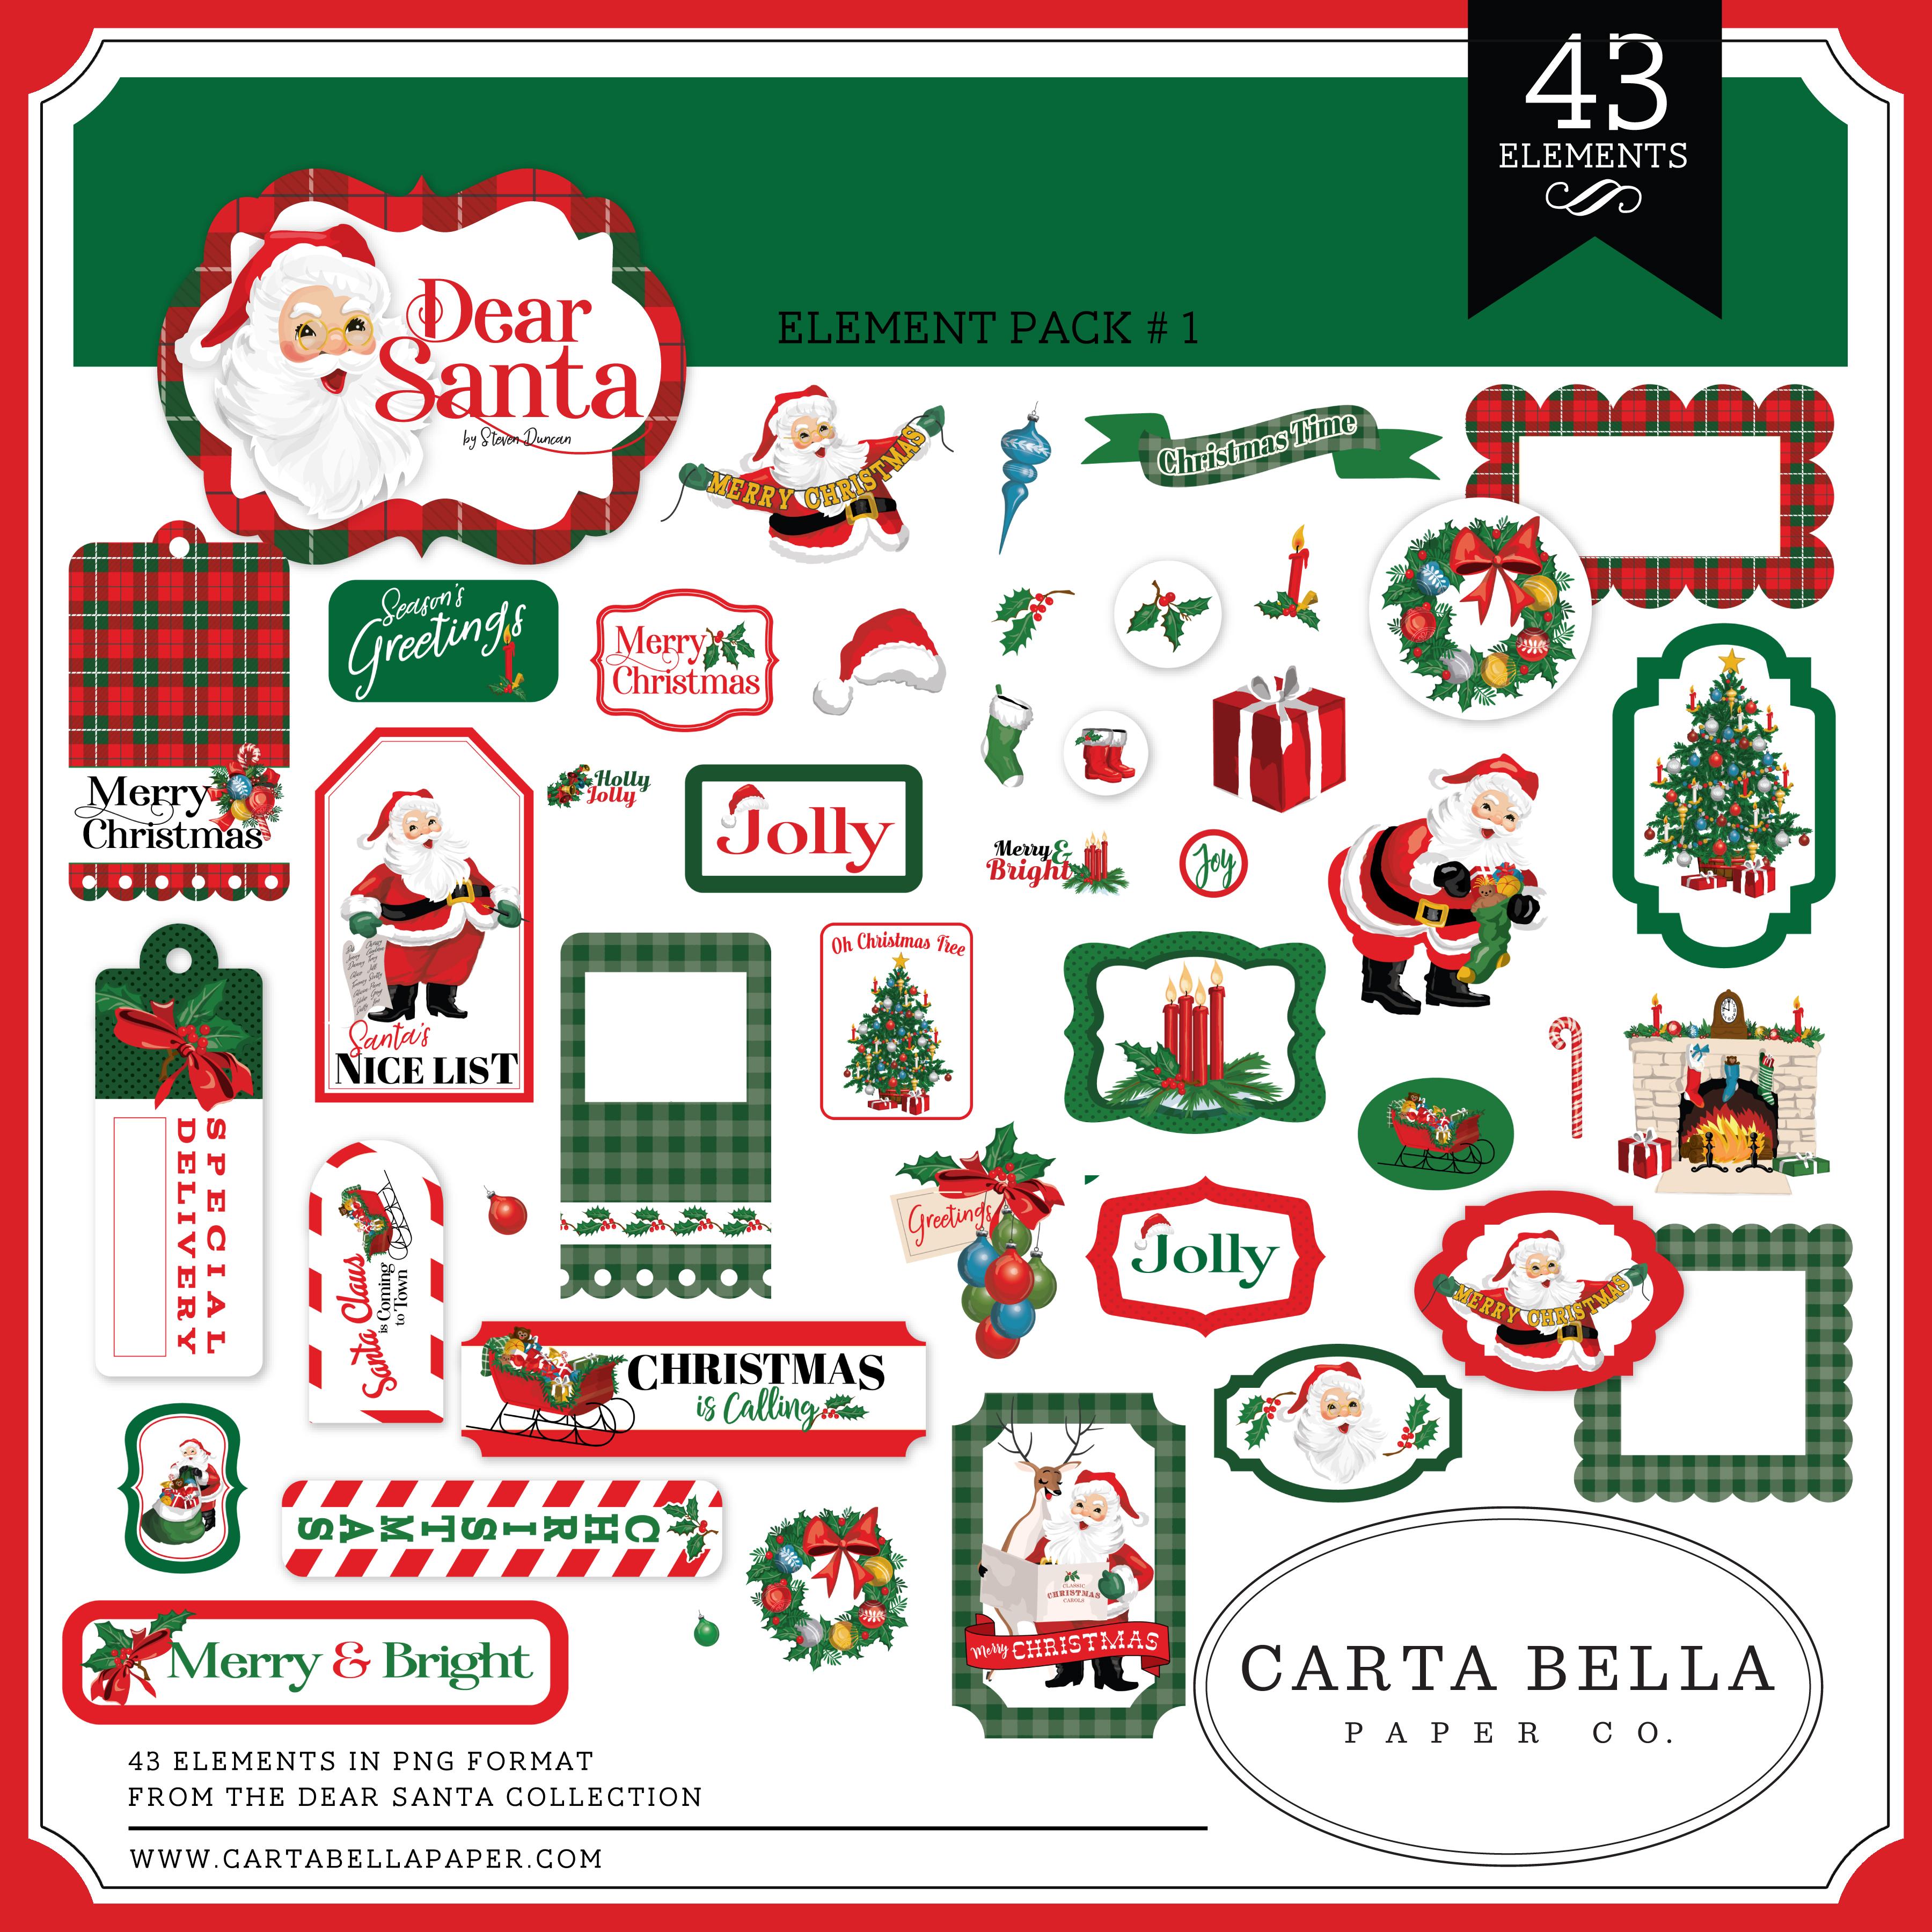 Dear Santa Element Pack #1